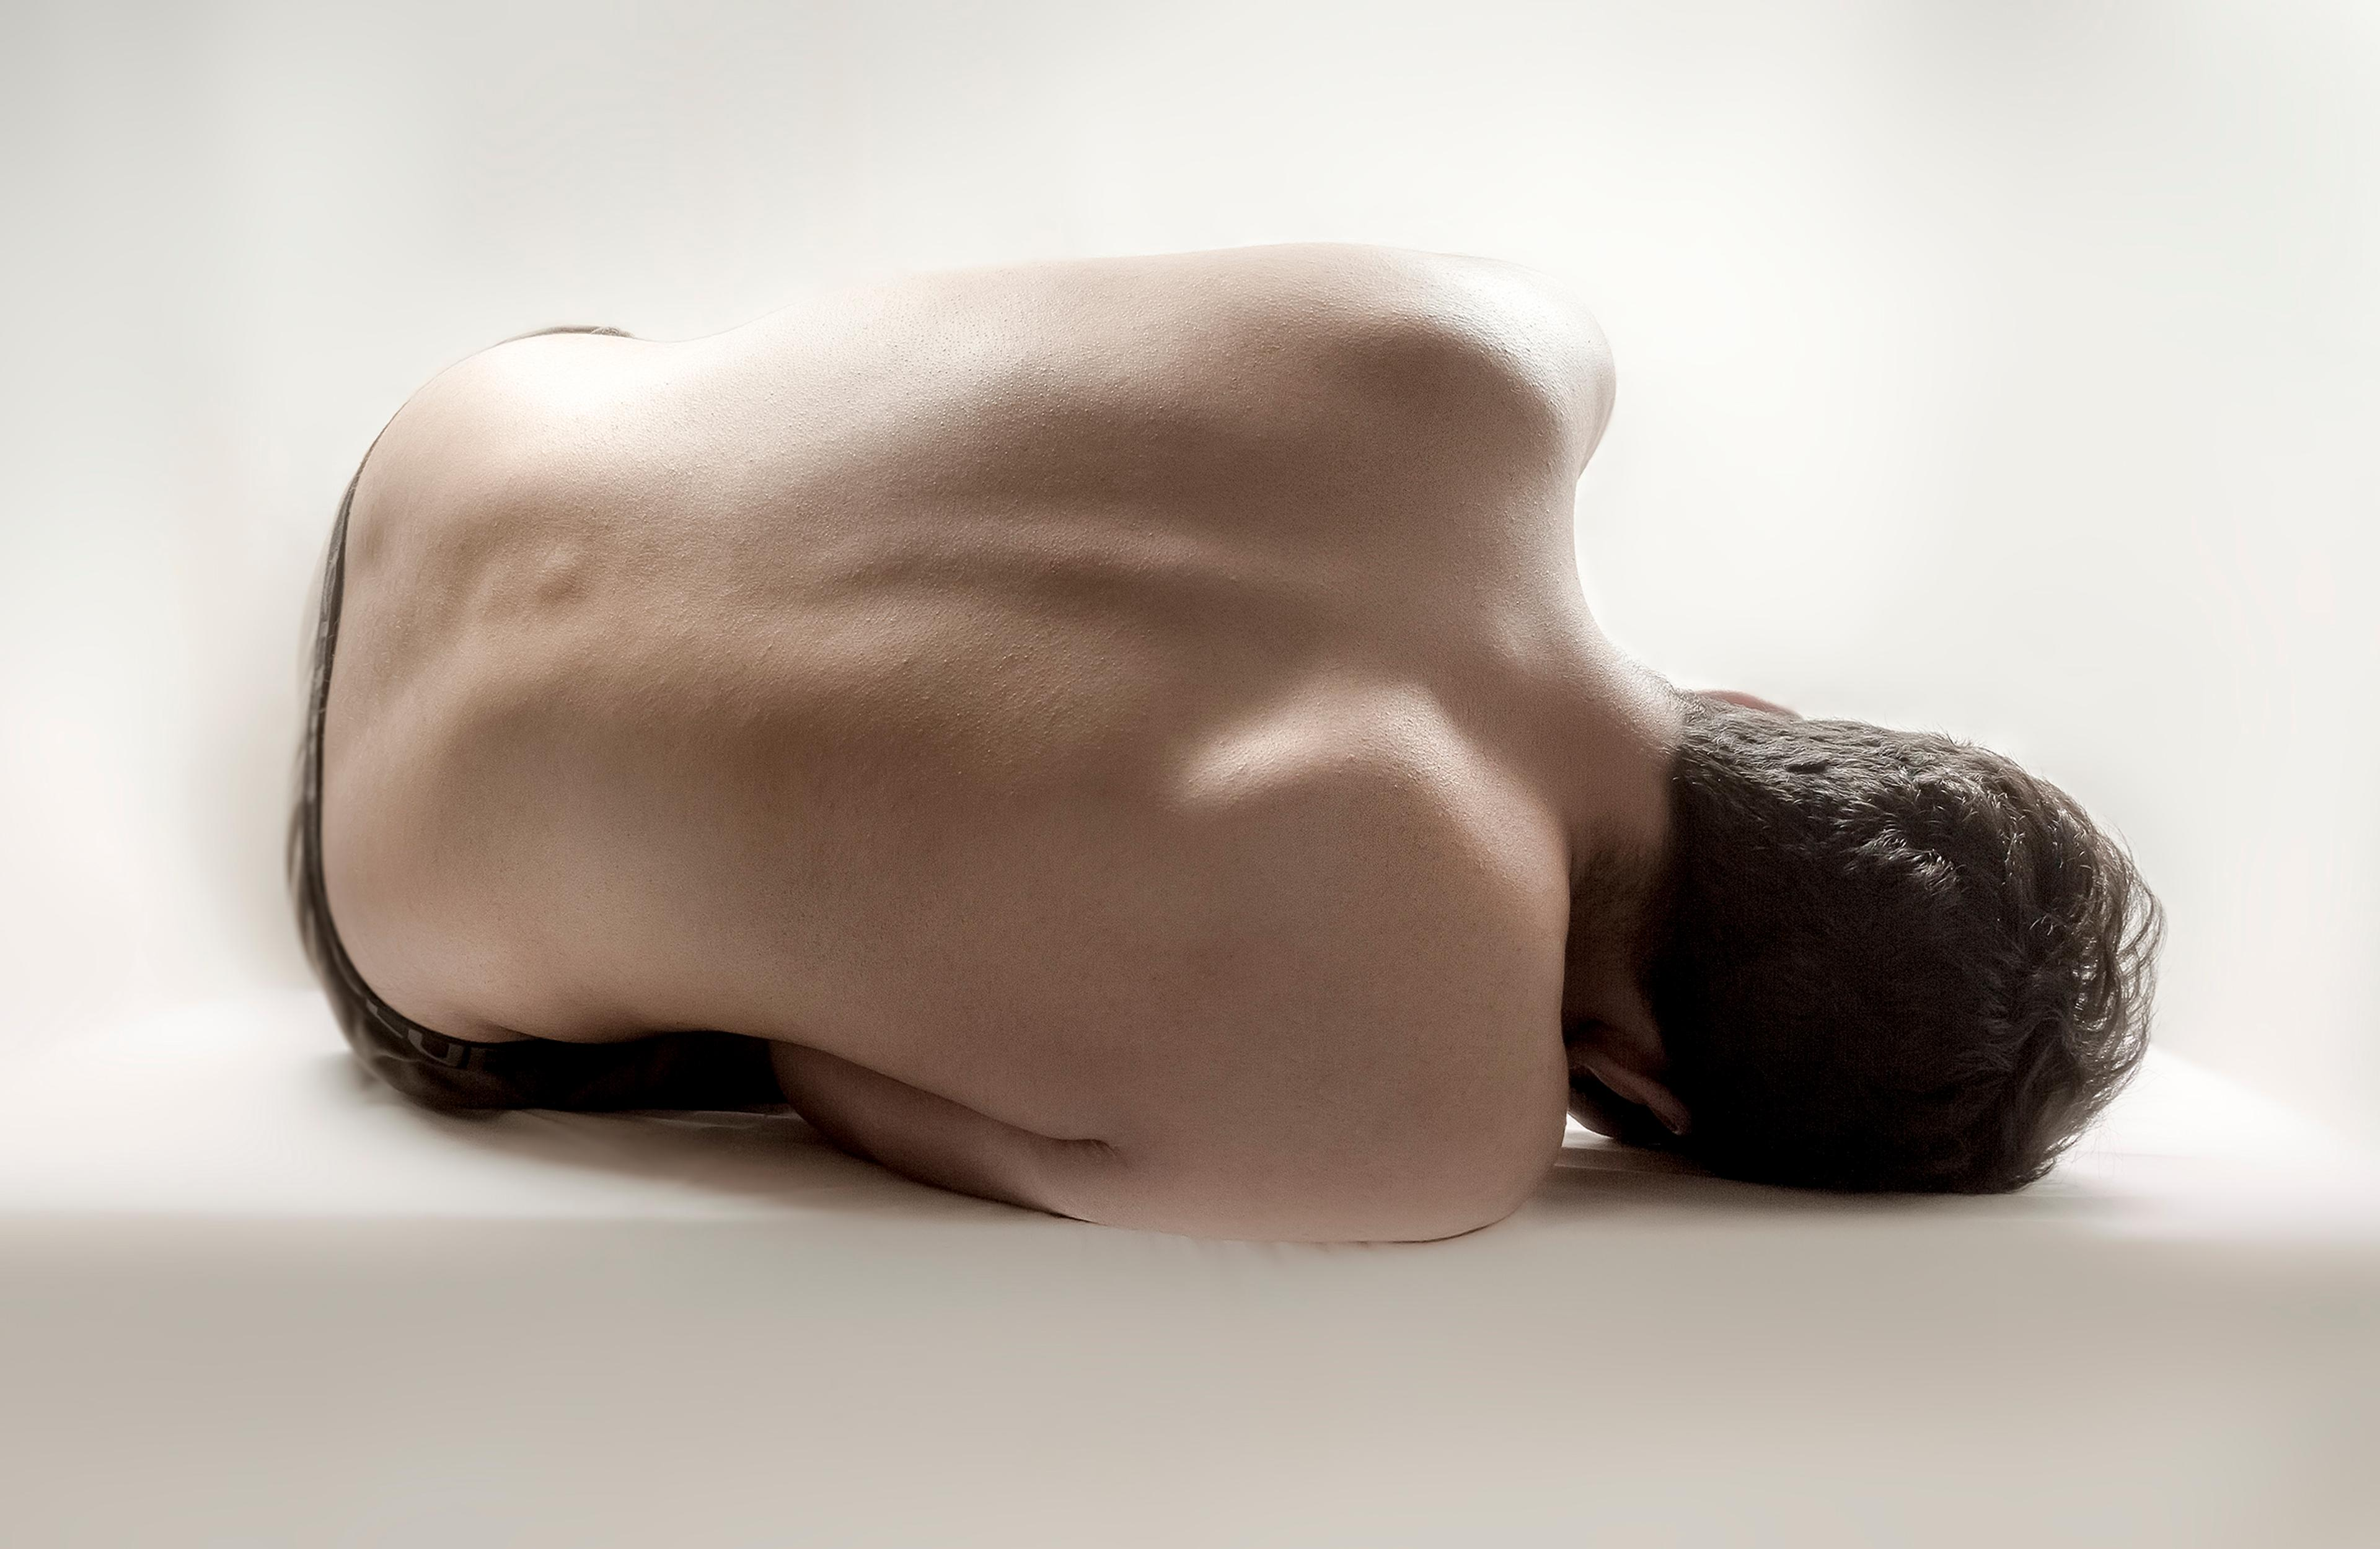 artwork Inhale by Farzin Foroutan